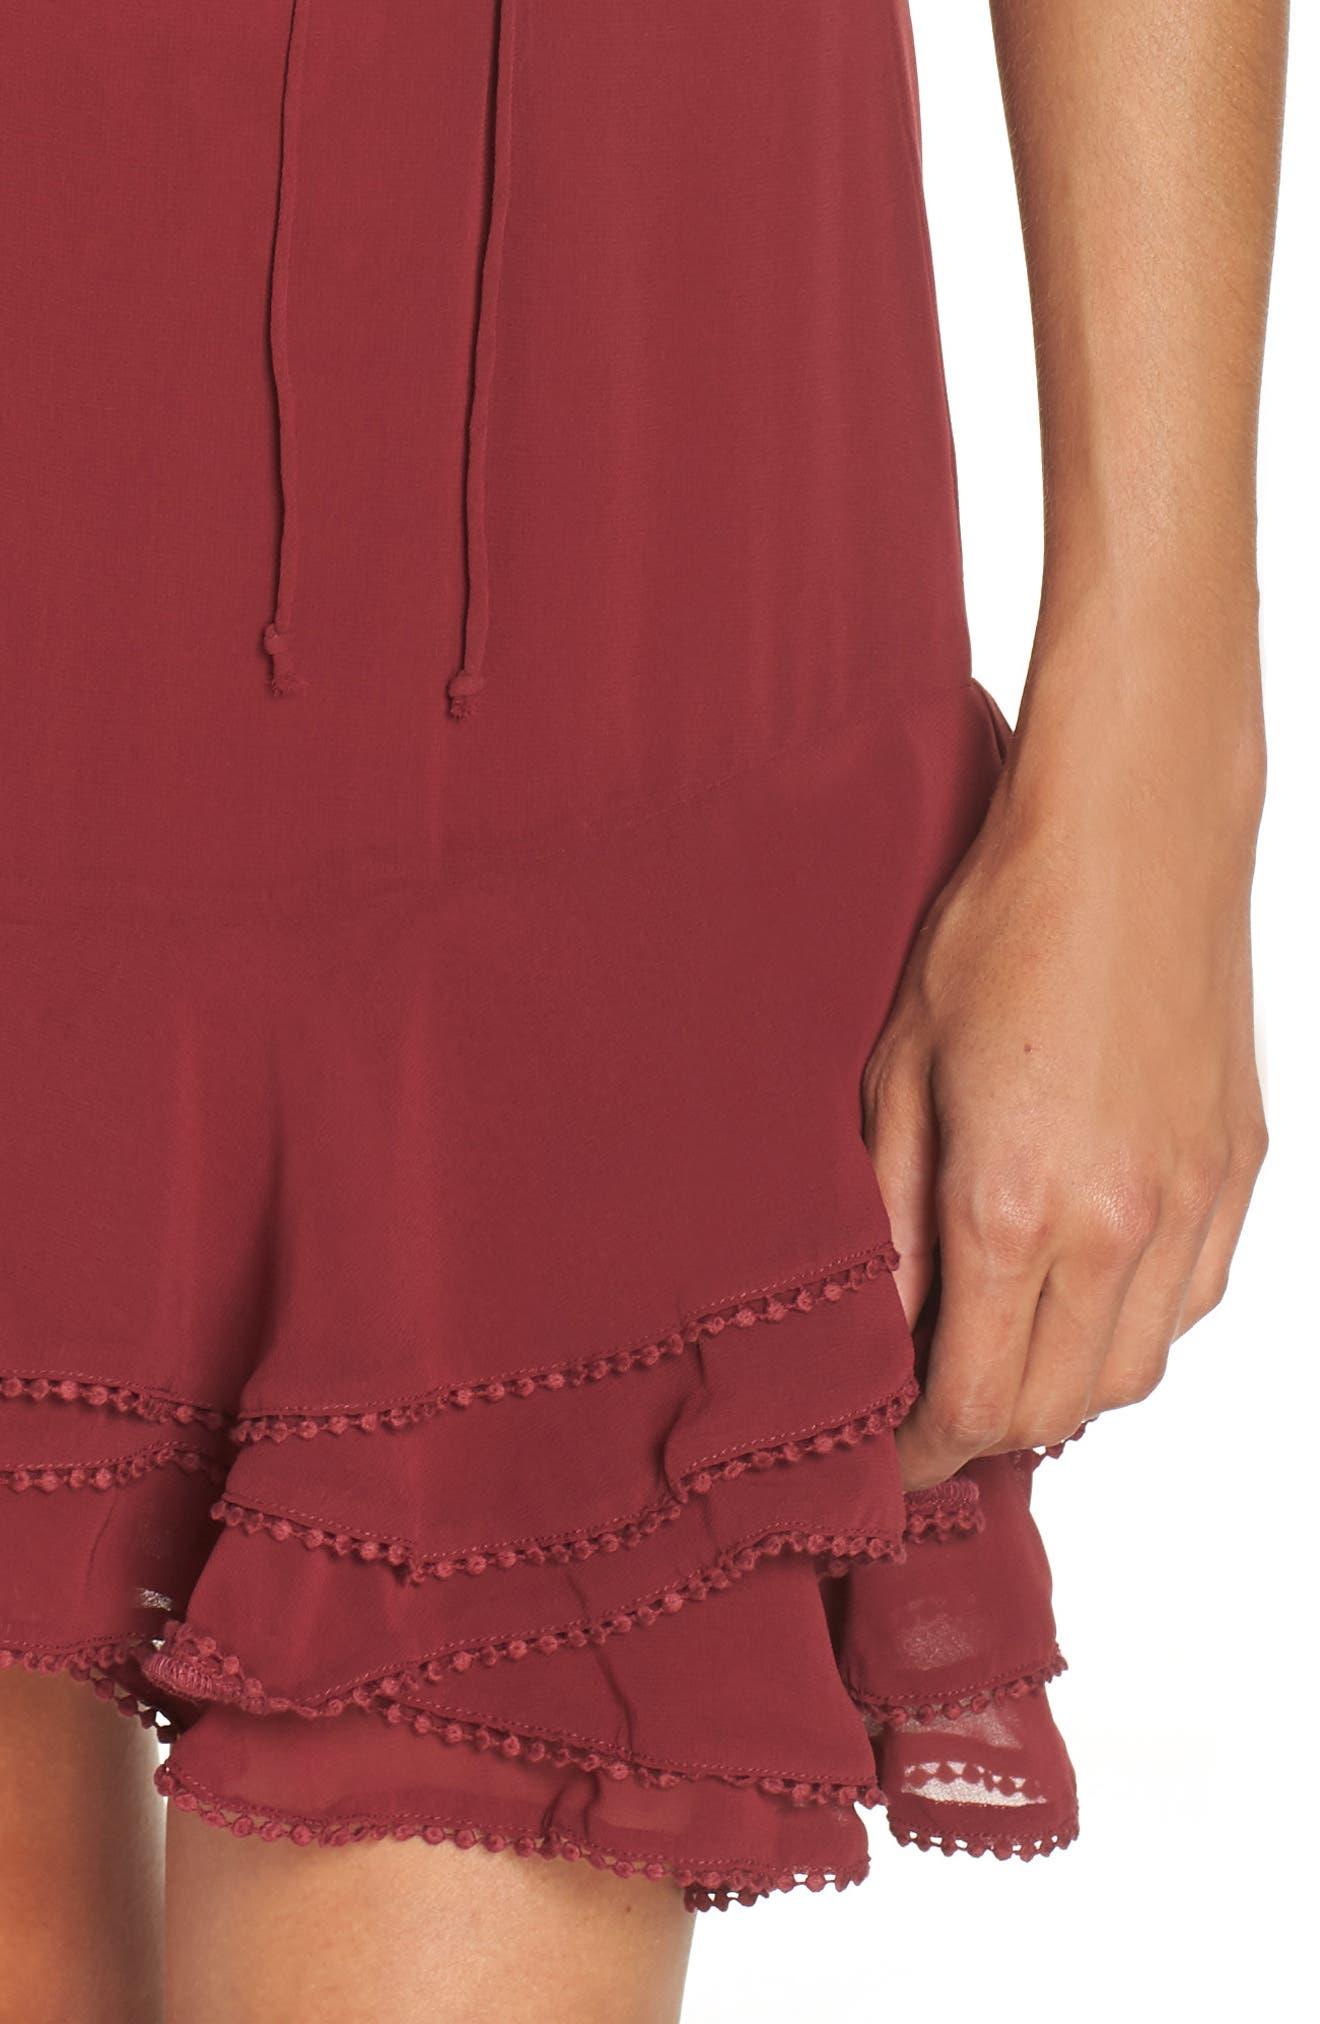 BB DAKOTA, Up All Night Layered Cold Shoulder Dress, Alternate thumbnail 5, color, 930